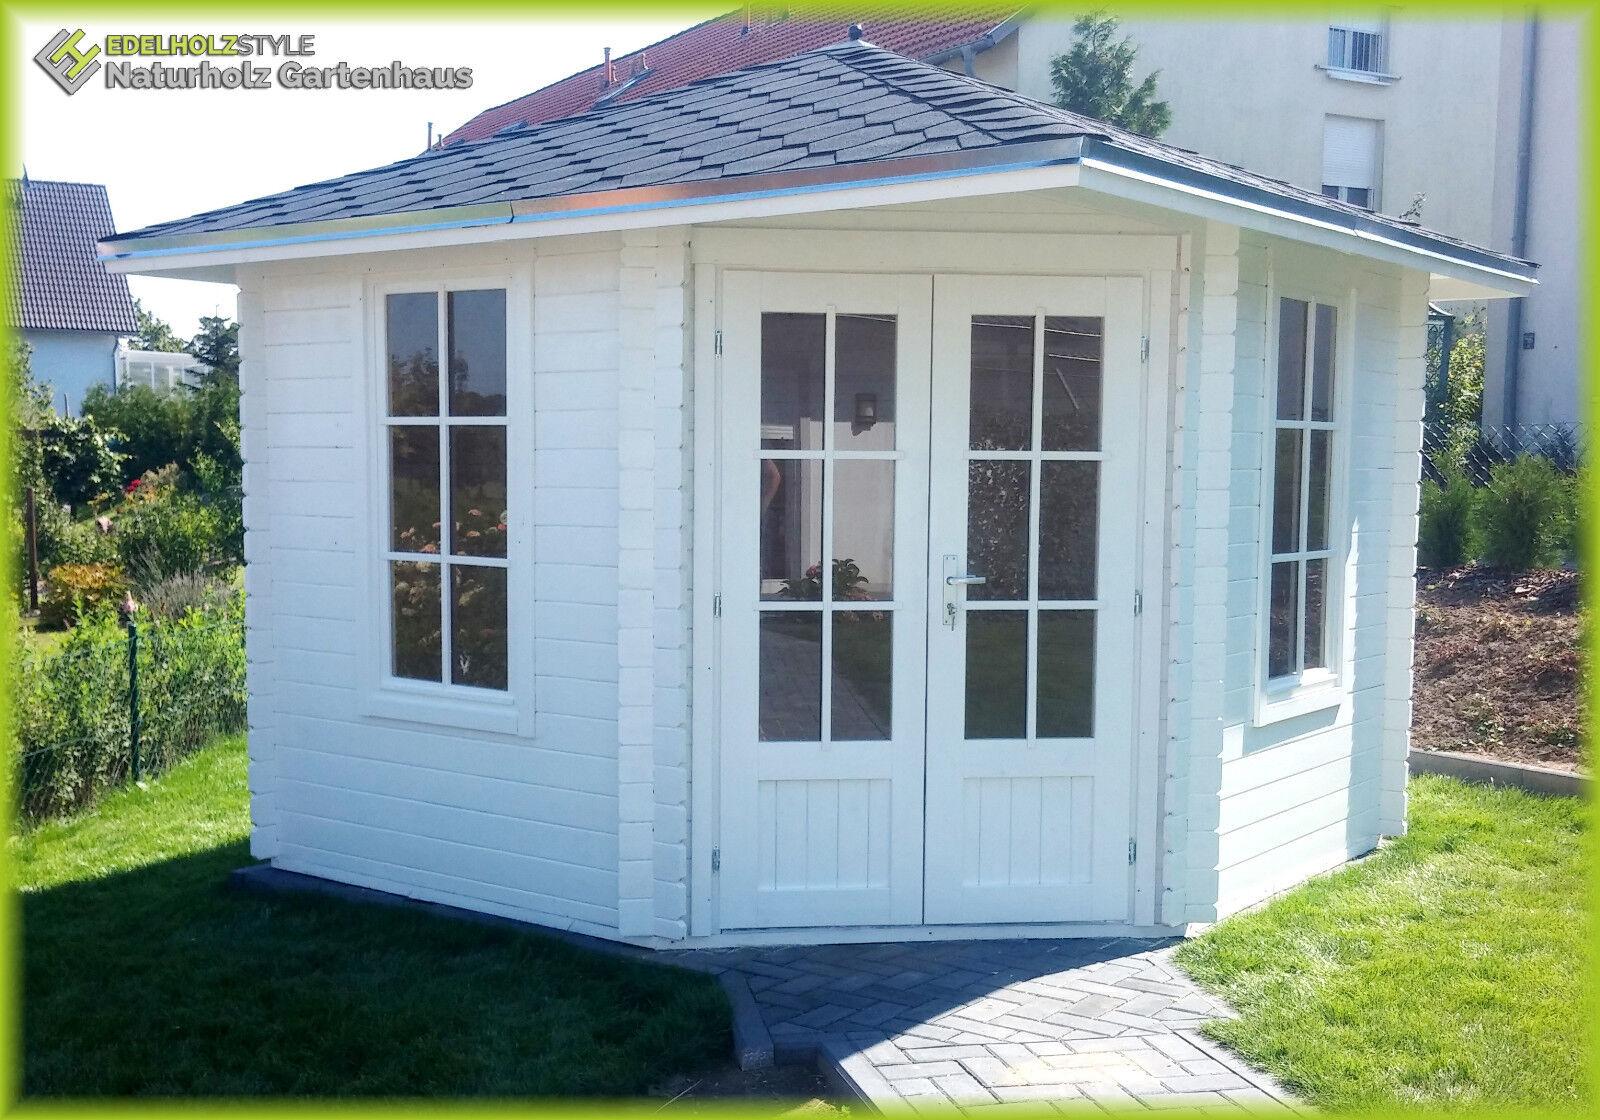 5 eck gartenhaus blockhaus 3x3m 5 eckige aus holz. Black Bedroom Furniture Sets. Home Design Ideas